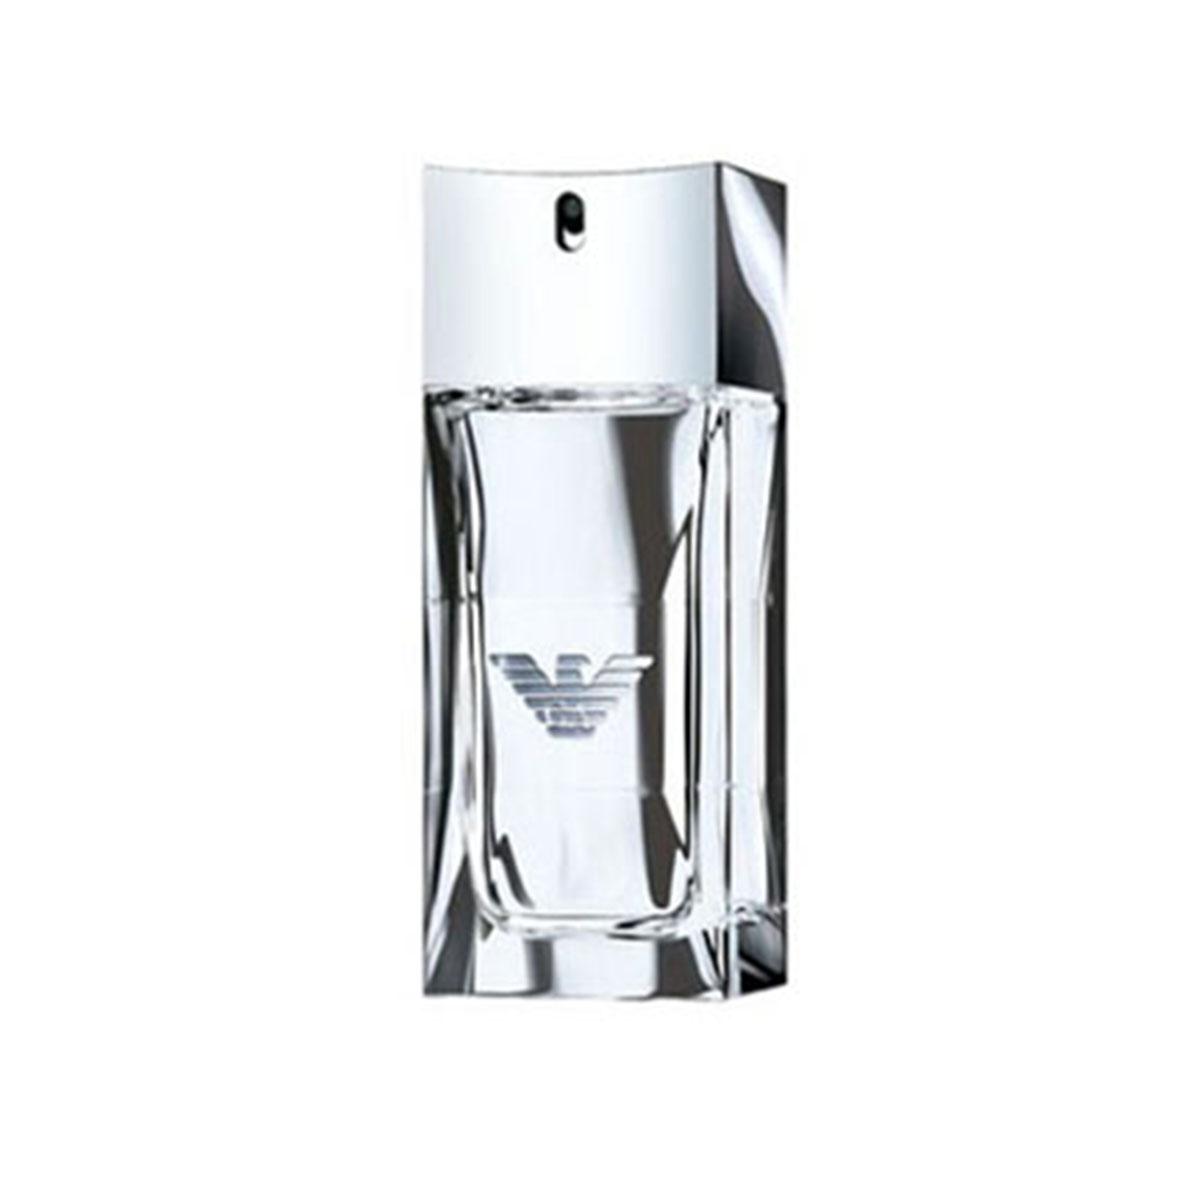 Giorgio armani diamonds pour homme eau de toilette 75ml vaporizador